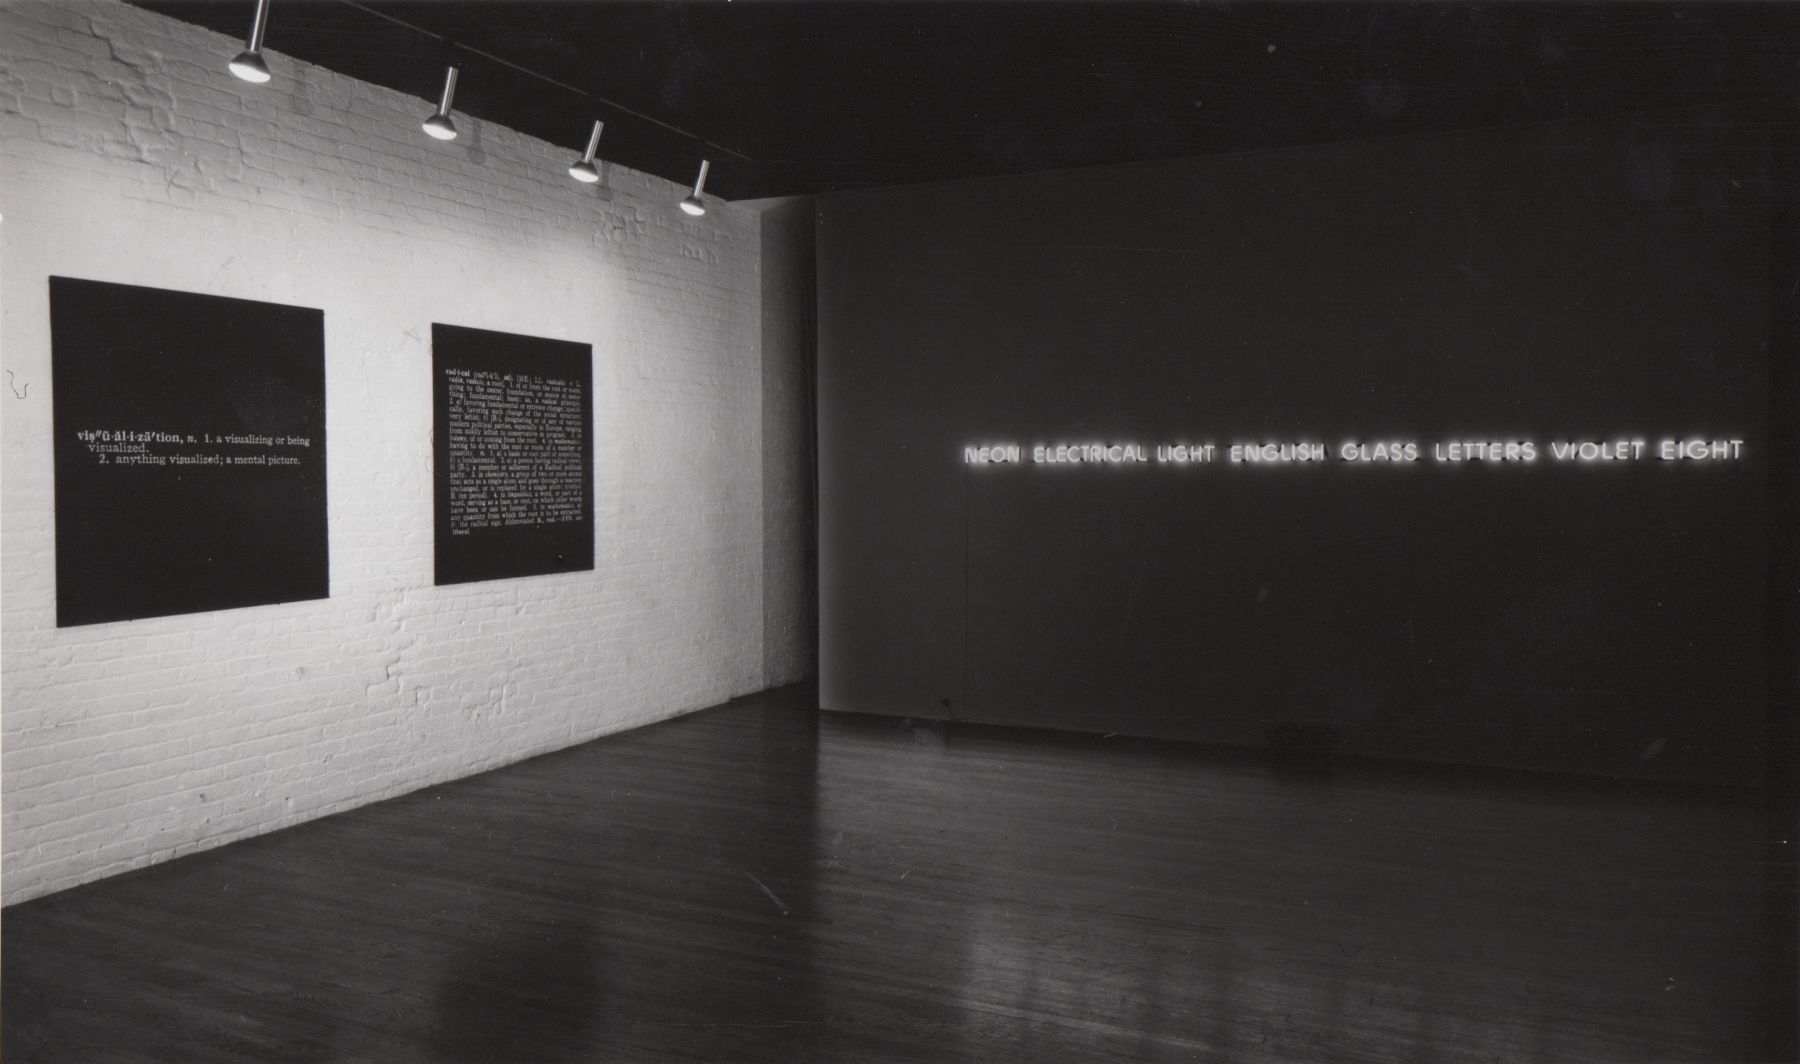 Installation view, Joseph Kosuth: Protoinvestigations 1965 - 1967, 420 WEST BROADWAY.